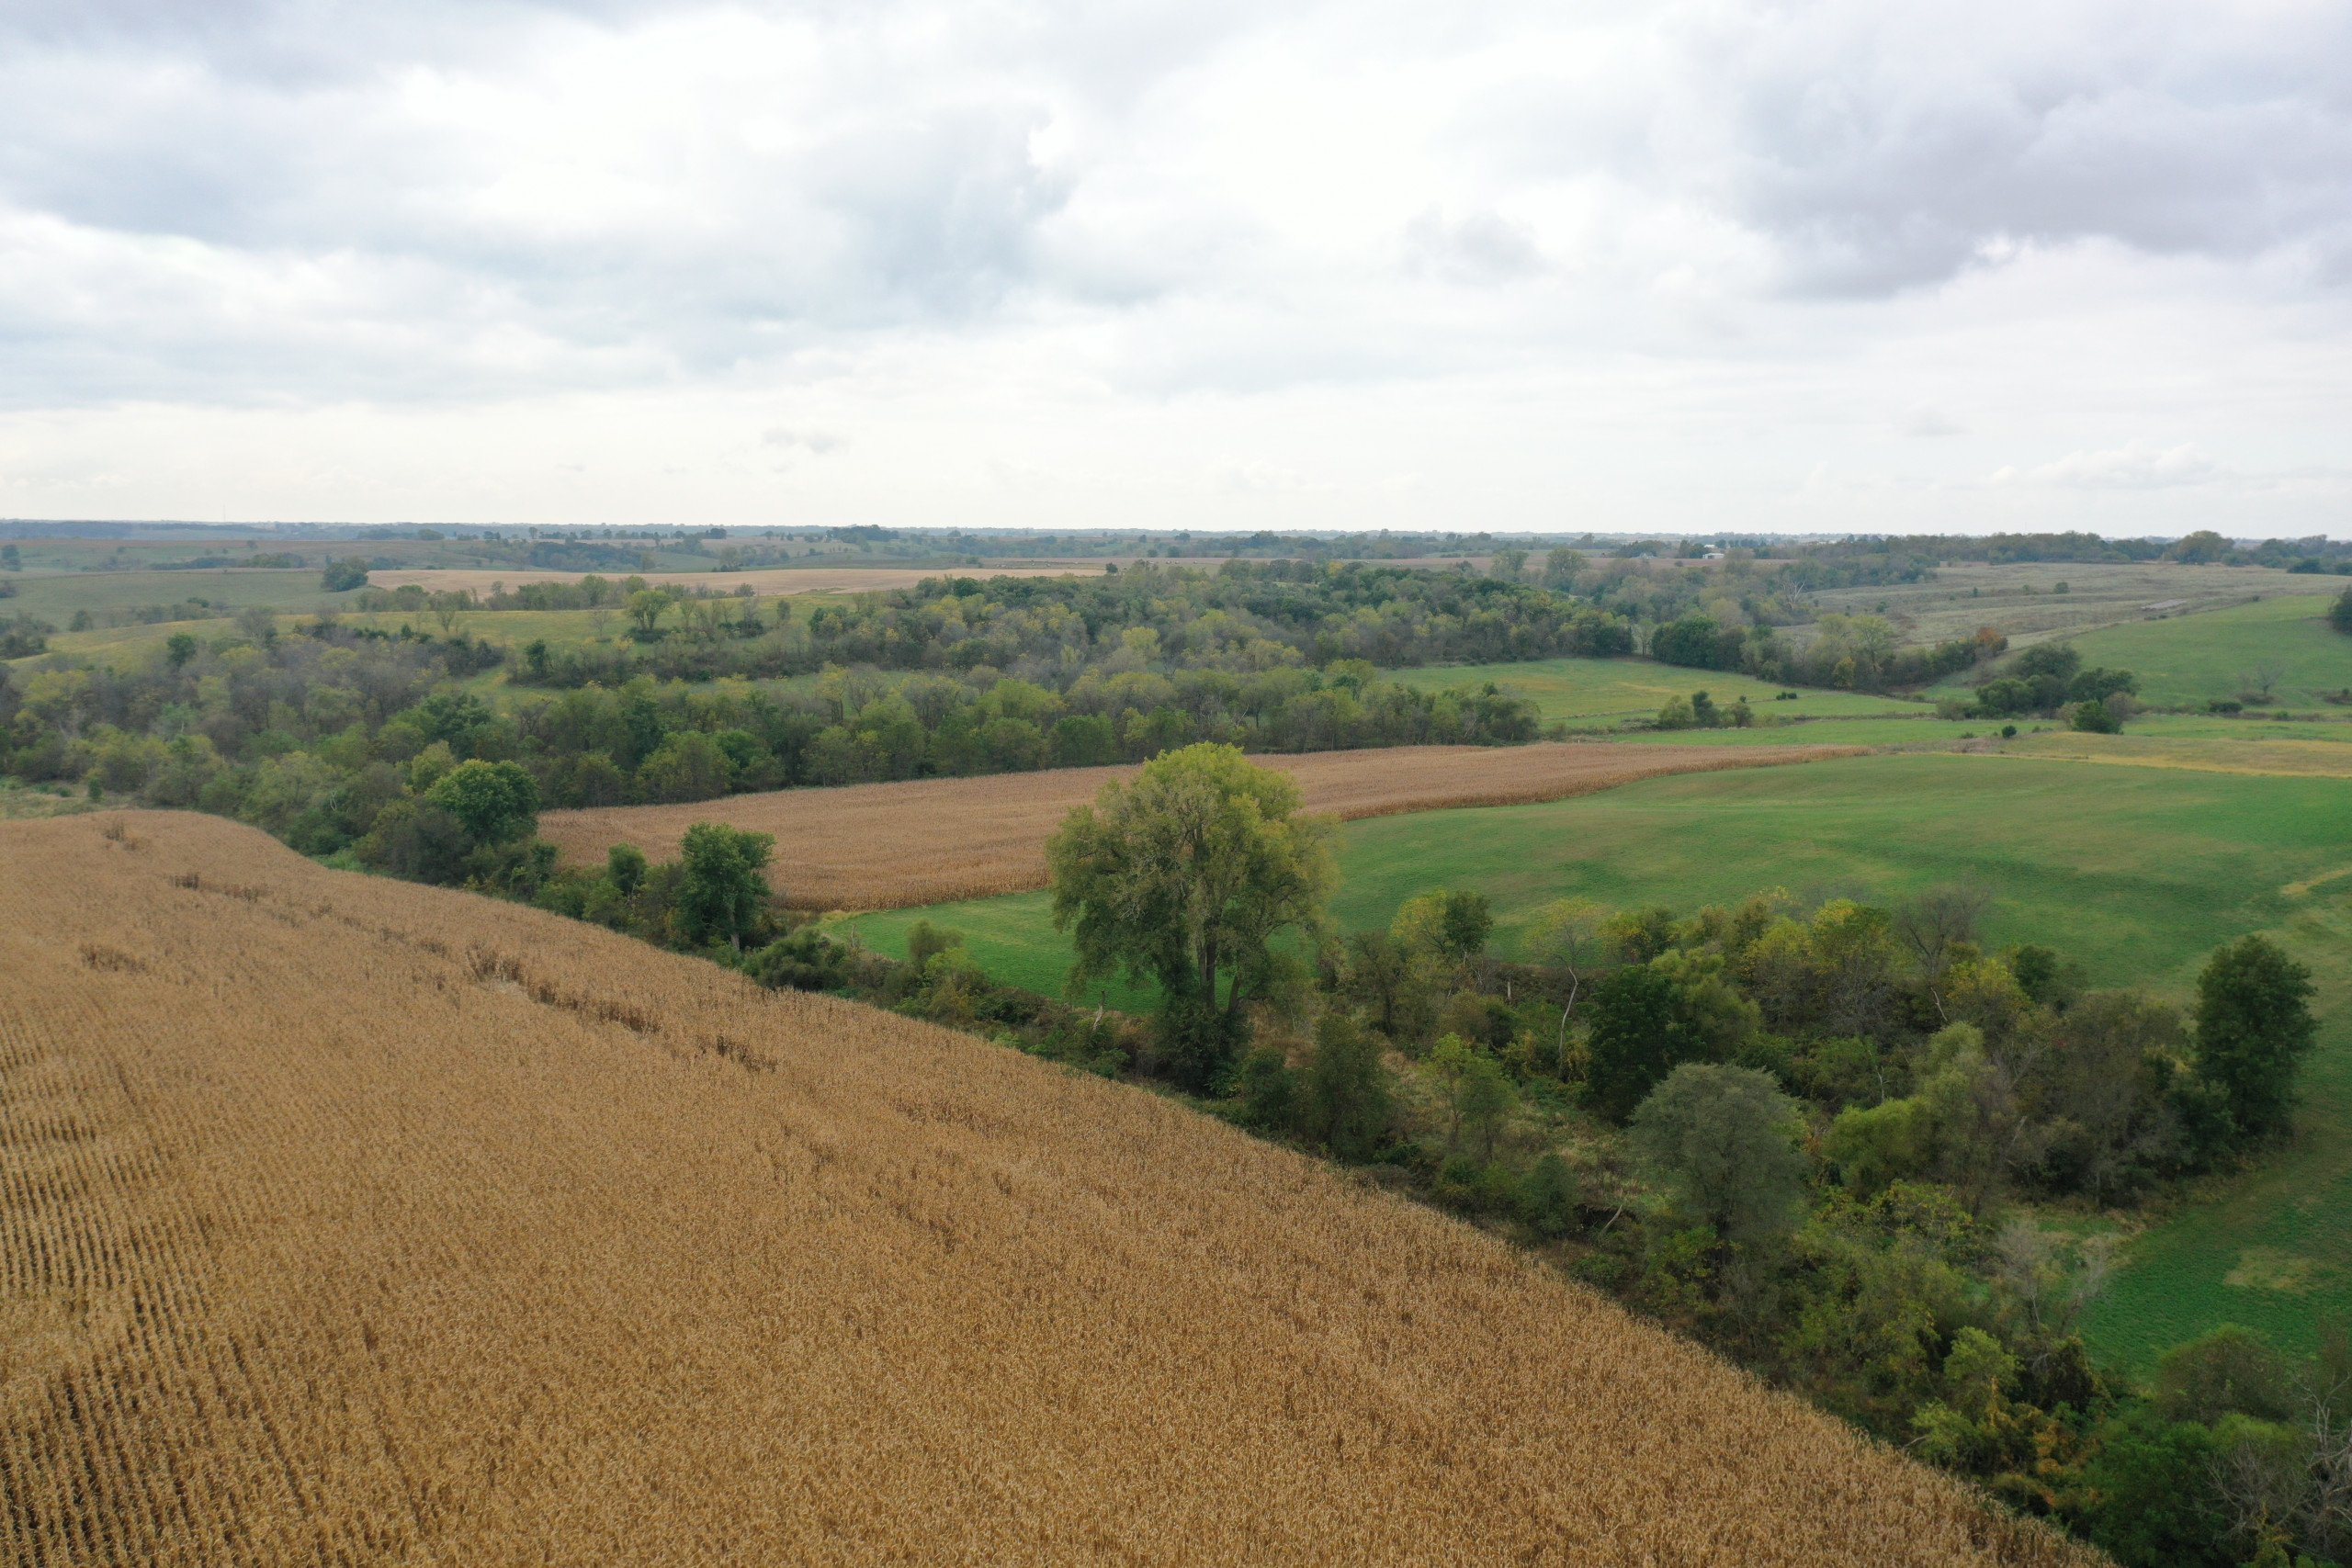 land-warren-county-iowa-200-acres-listing-number-15810-DJI_0579-2.jpg